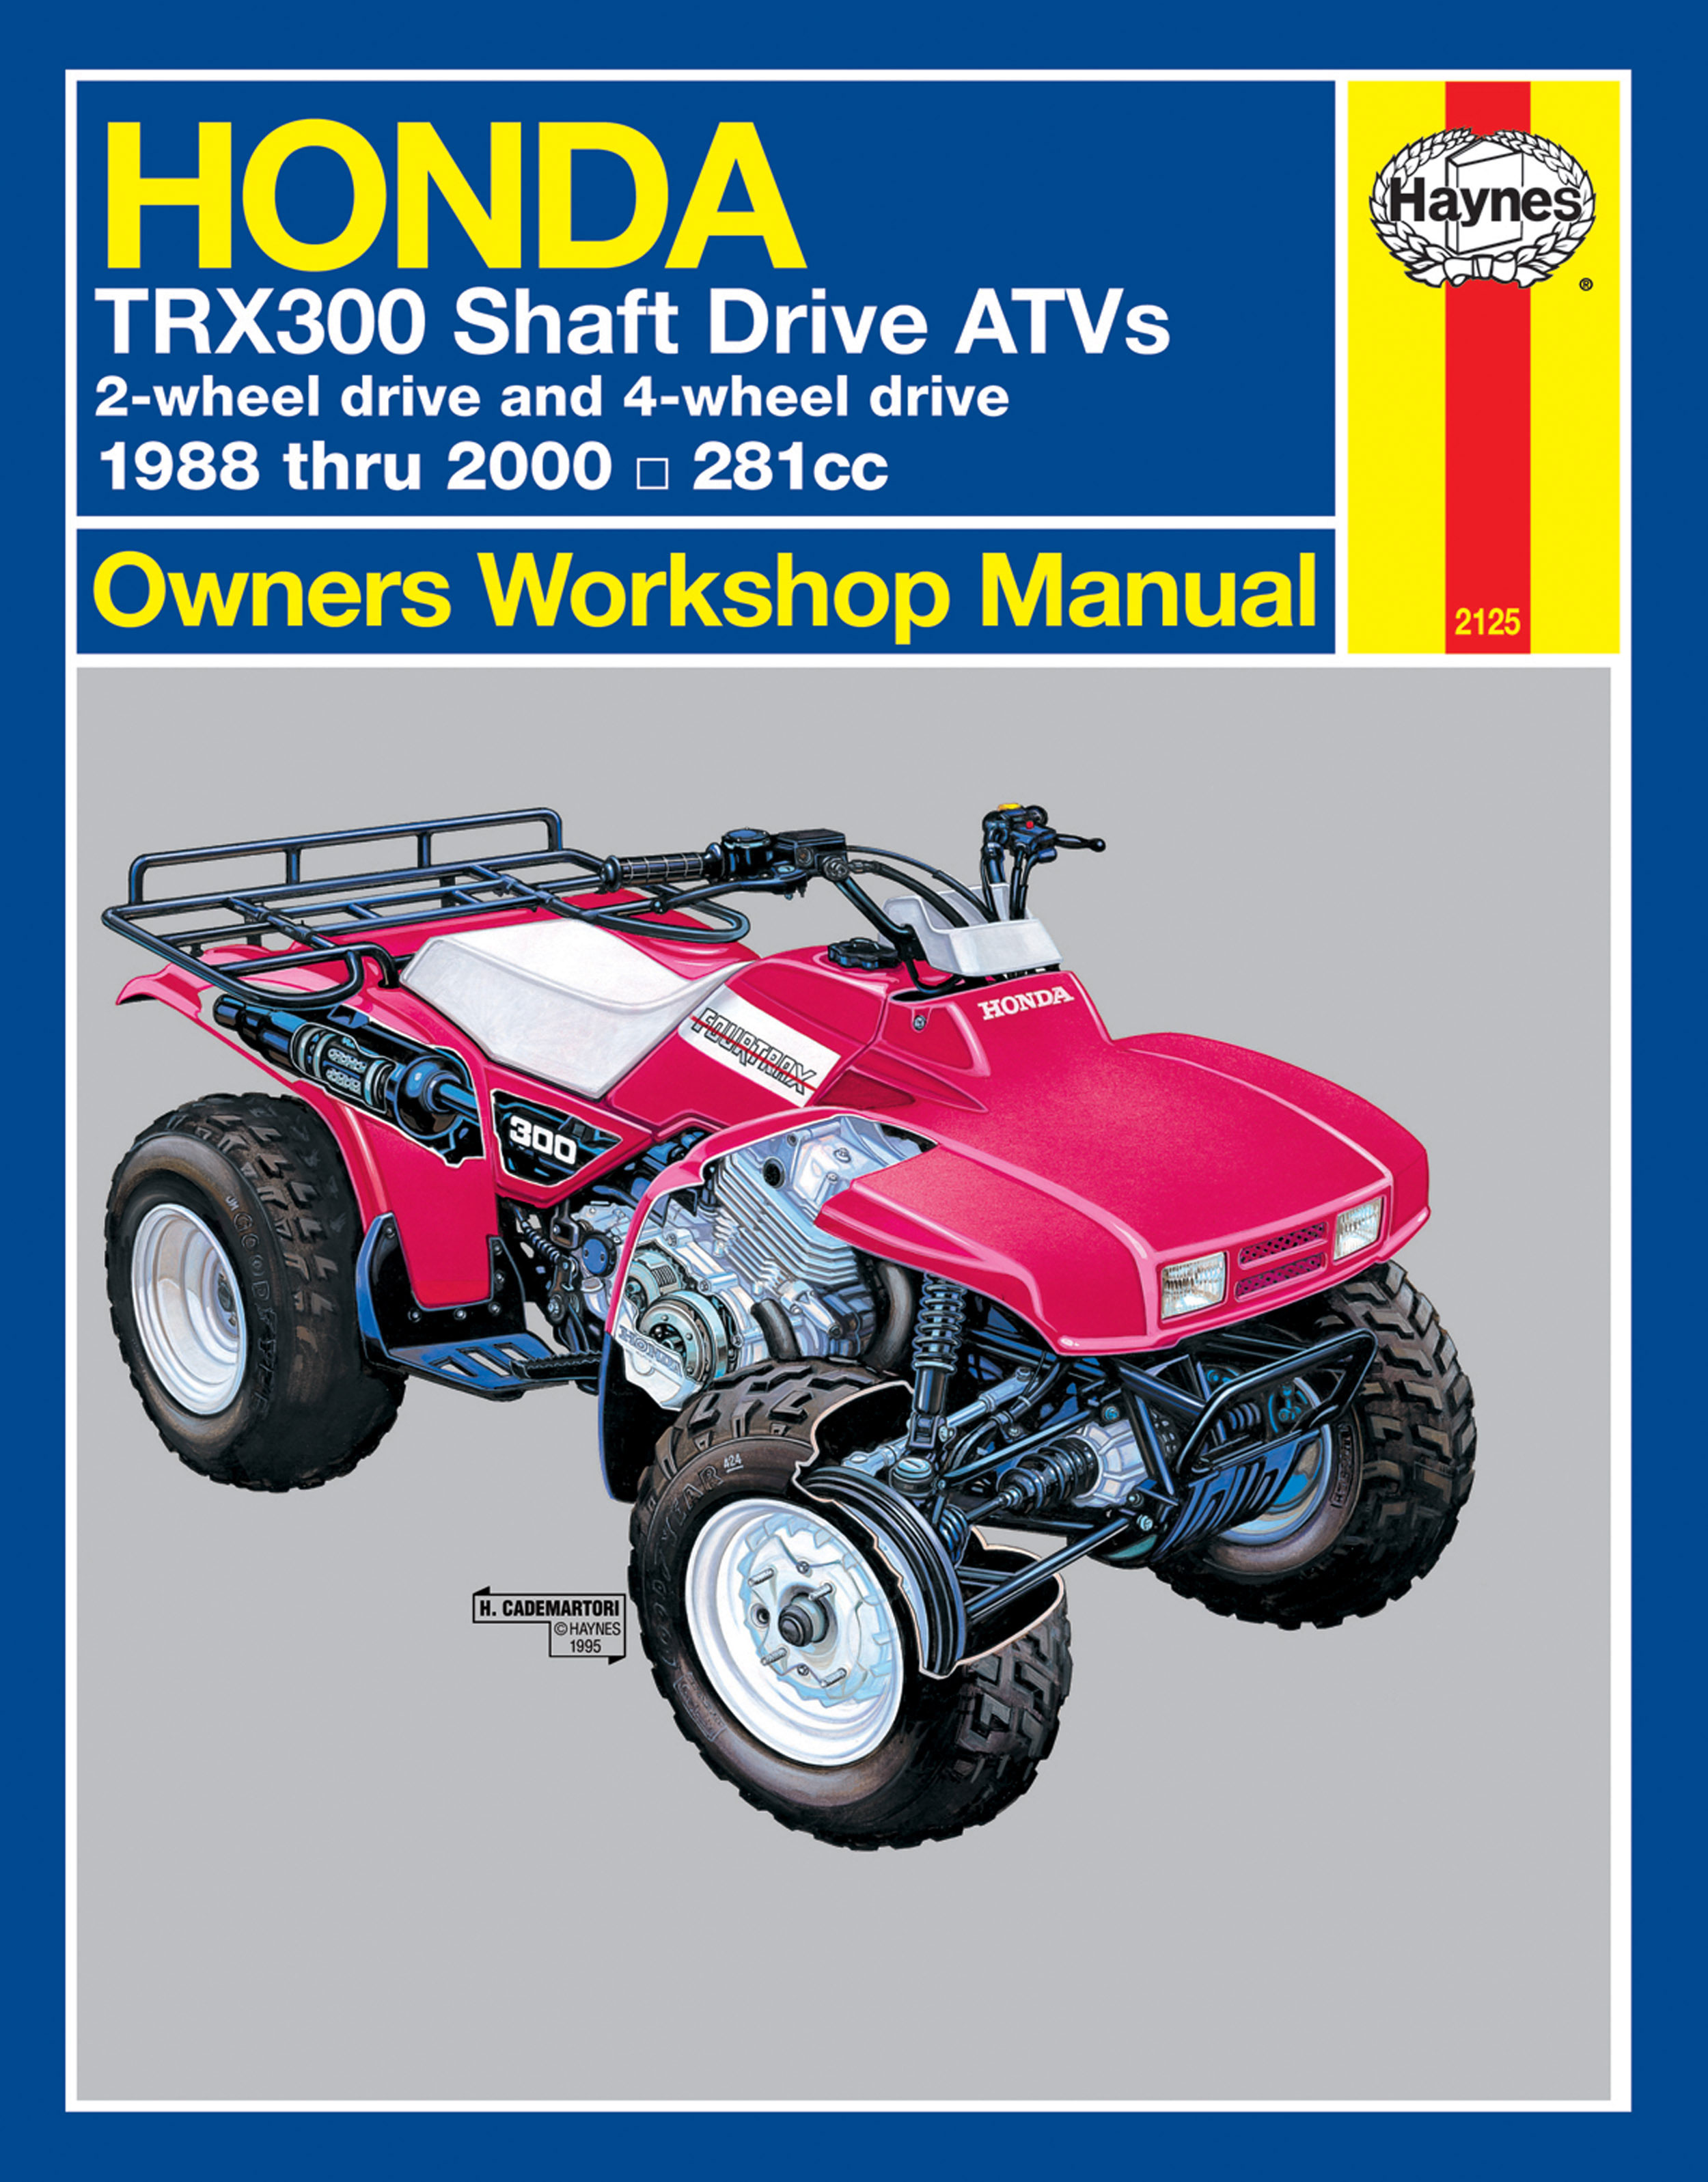 HAYNES Repair Manual - Honda ATV TRX300 Shaft Drive (1988-2000)